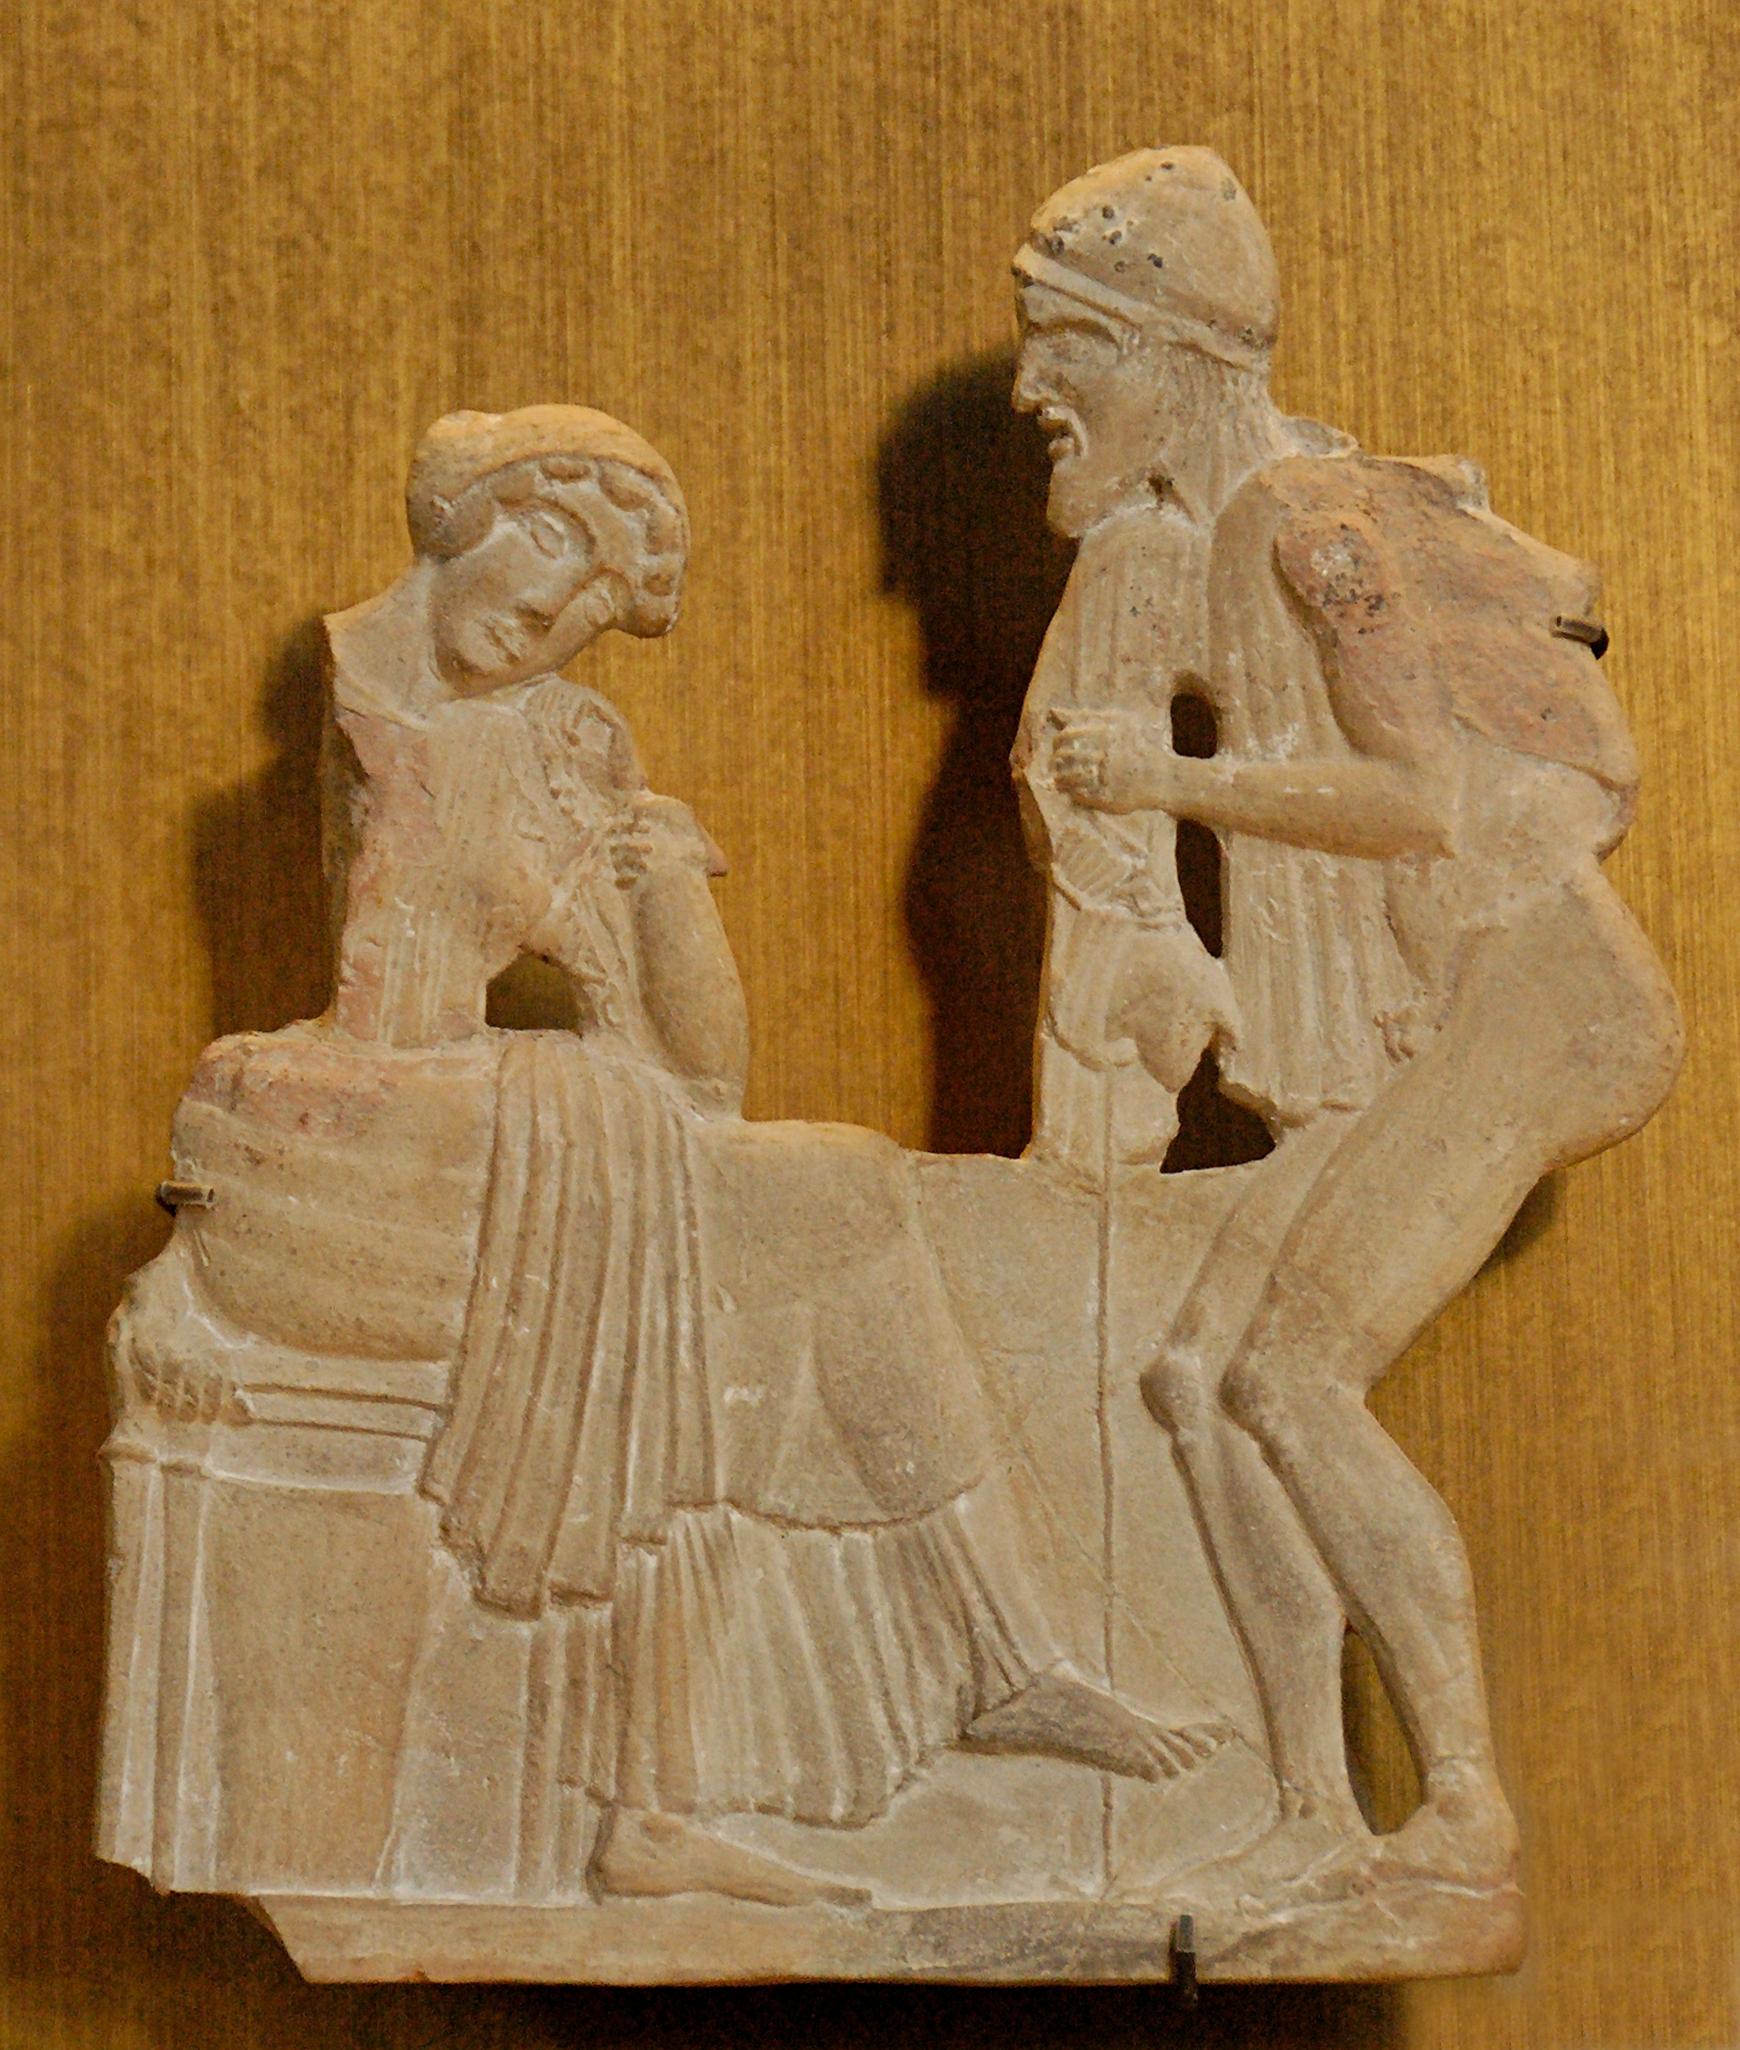 http://upload.wikimedia.org/wikipedia/commons/3/30/Odysseus_Penelope_Louvre_CA860.jpg